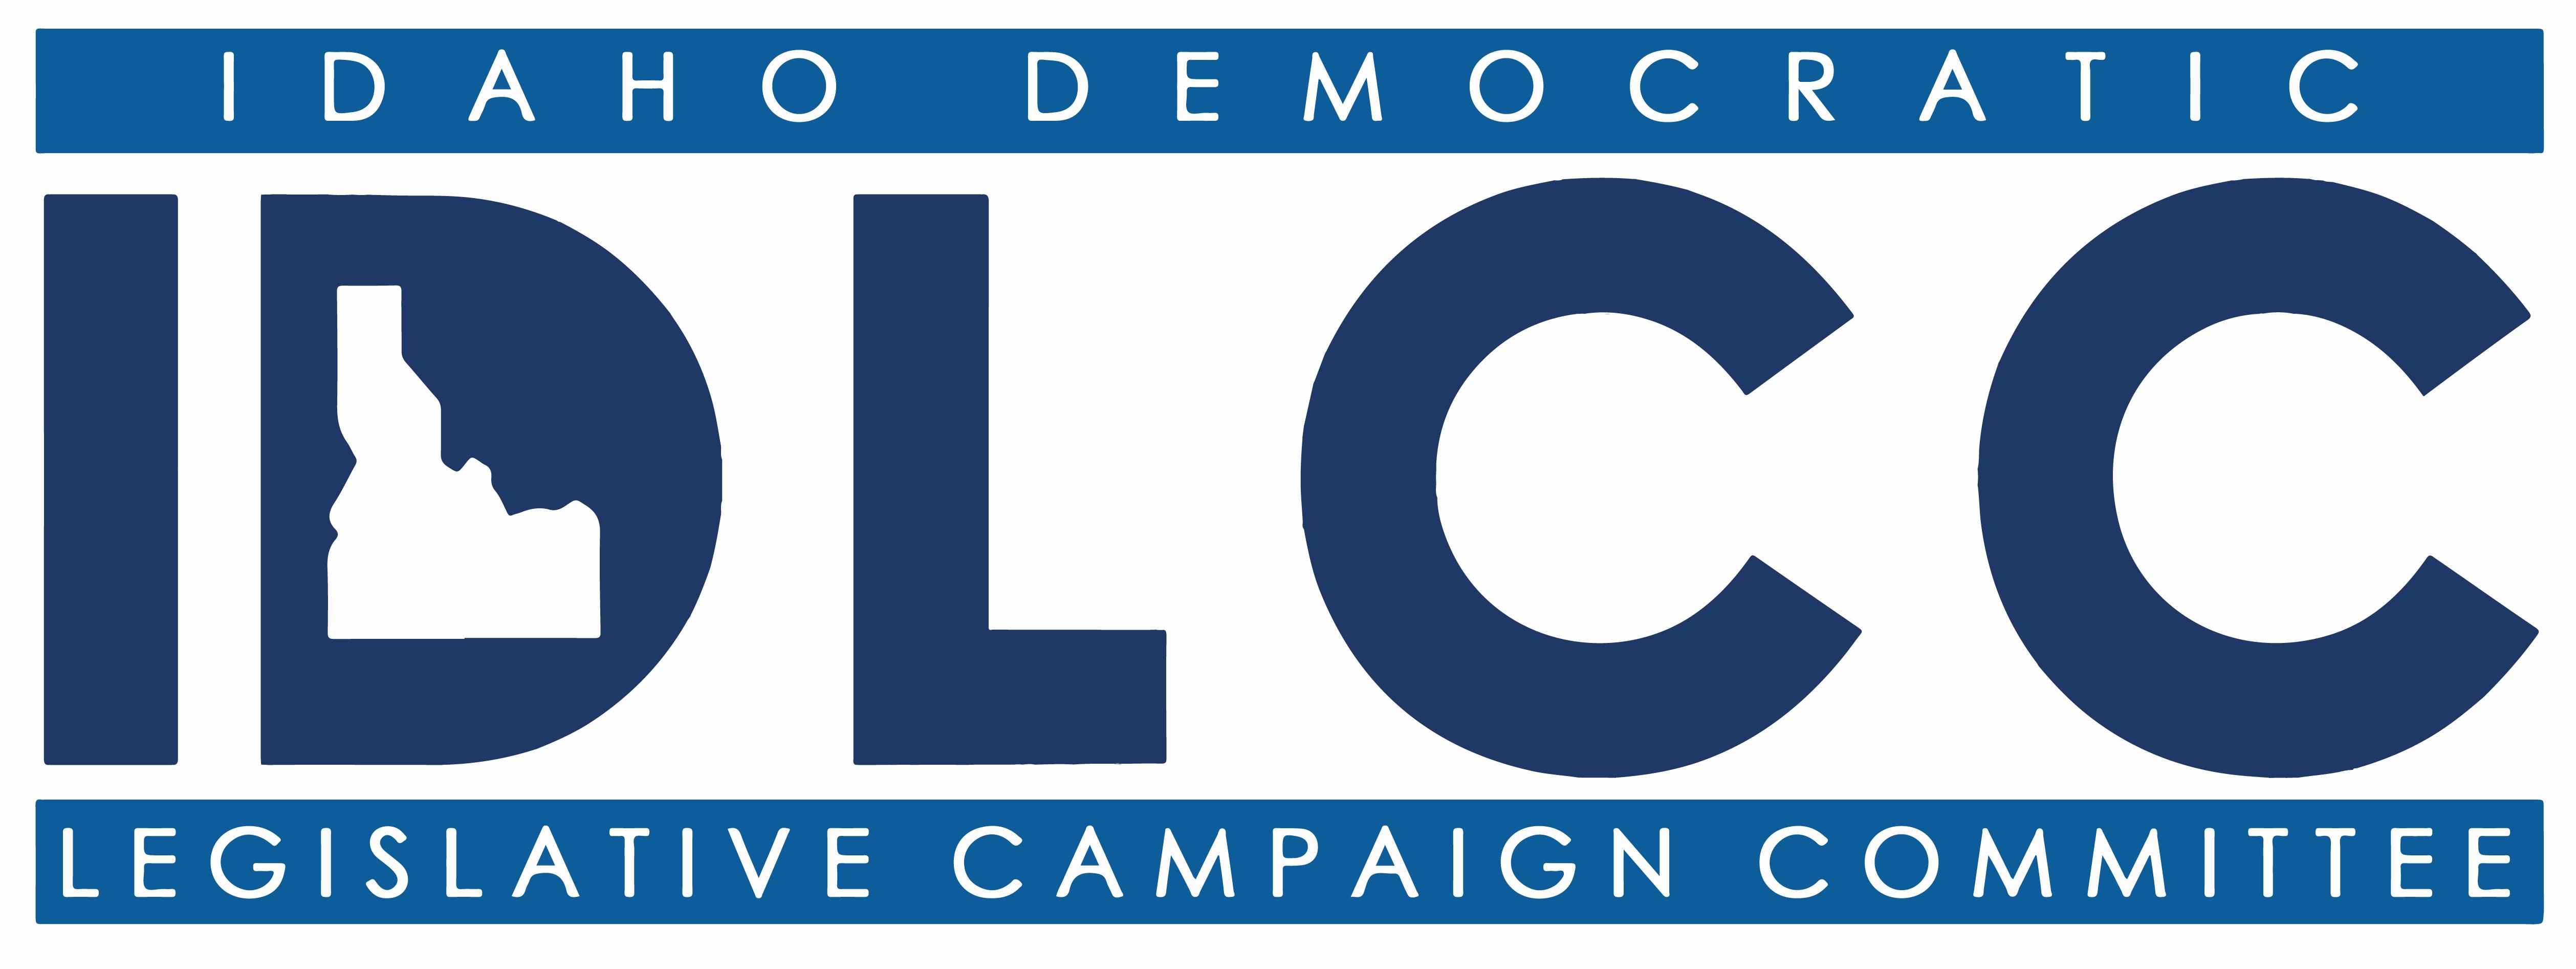 Idaho Democratic Legislative Campaign Committee